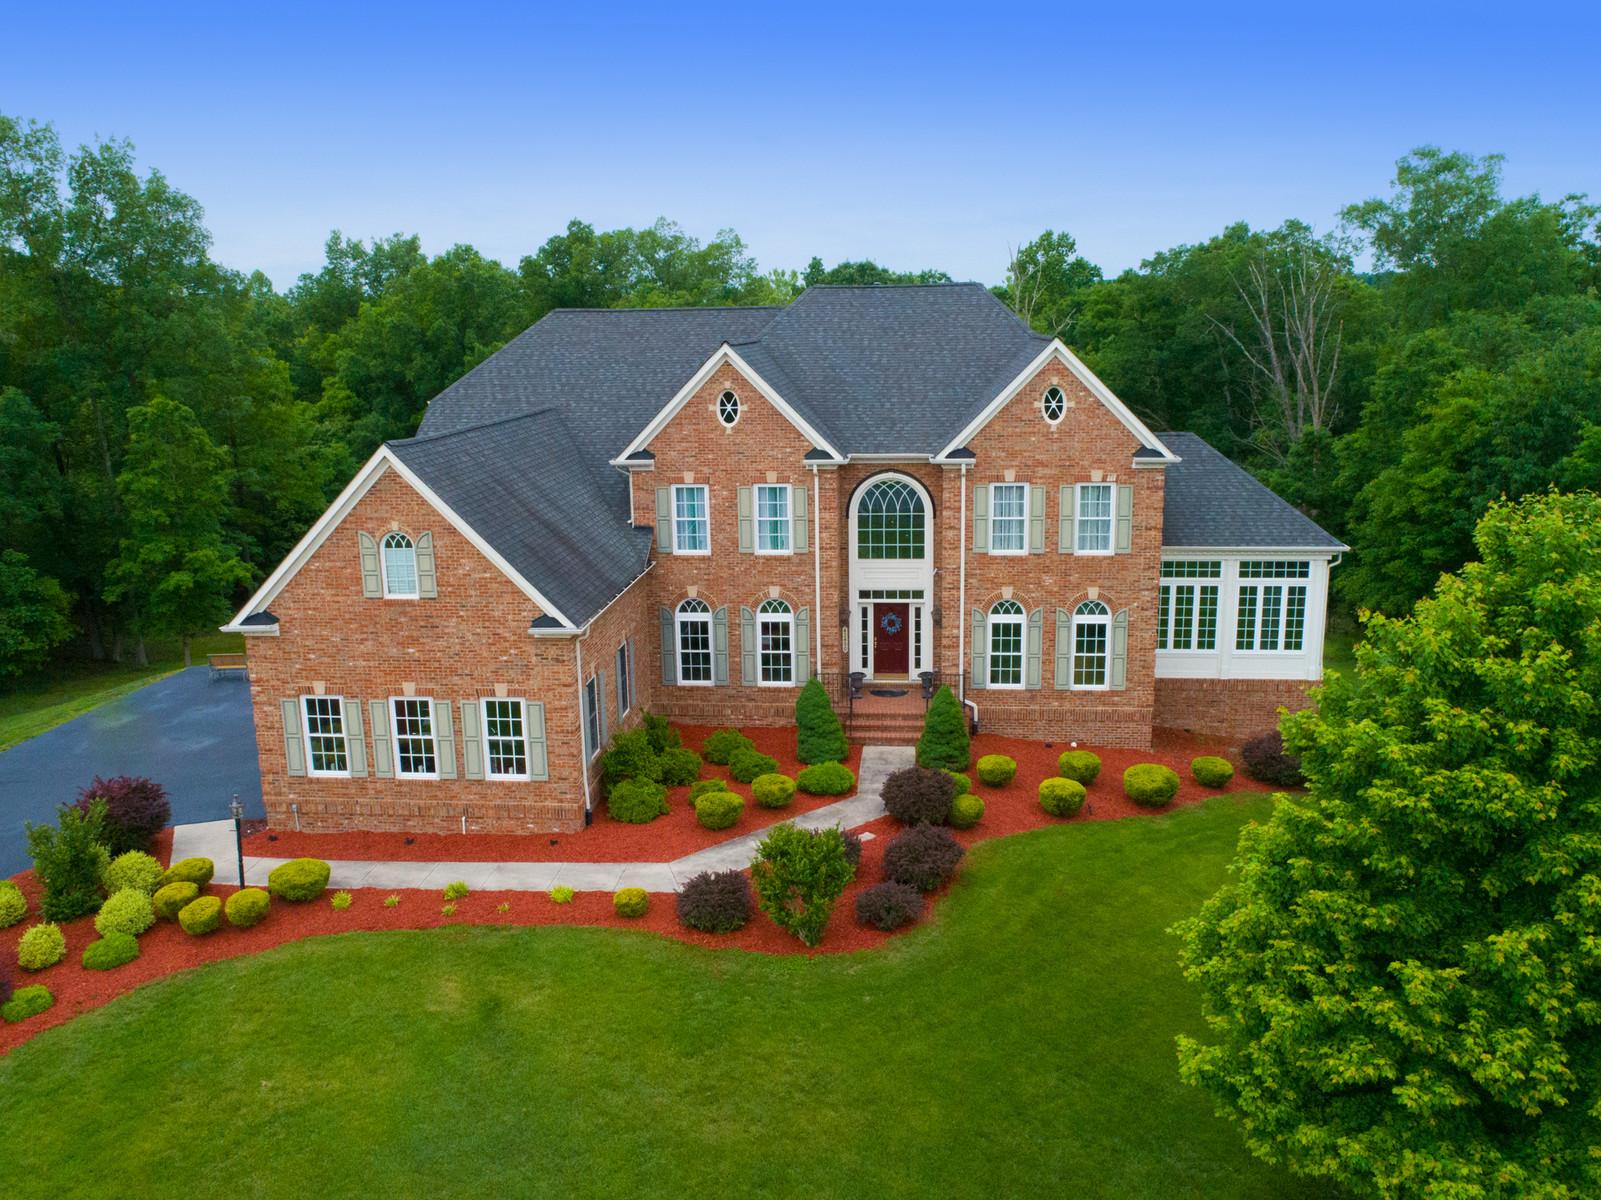 独户住宅 为 销售 在 7,500 Square Foot NV Home Clifton Park on 3 Acres 42490 Iron Bit Pl 尚蒂利, 弗吉尼亚州 20152 美国